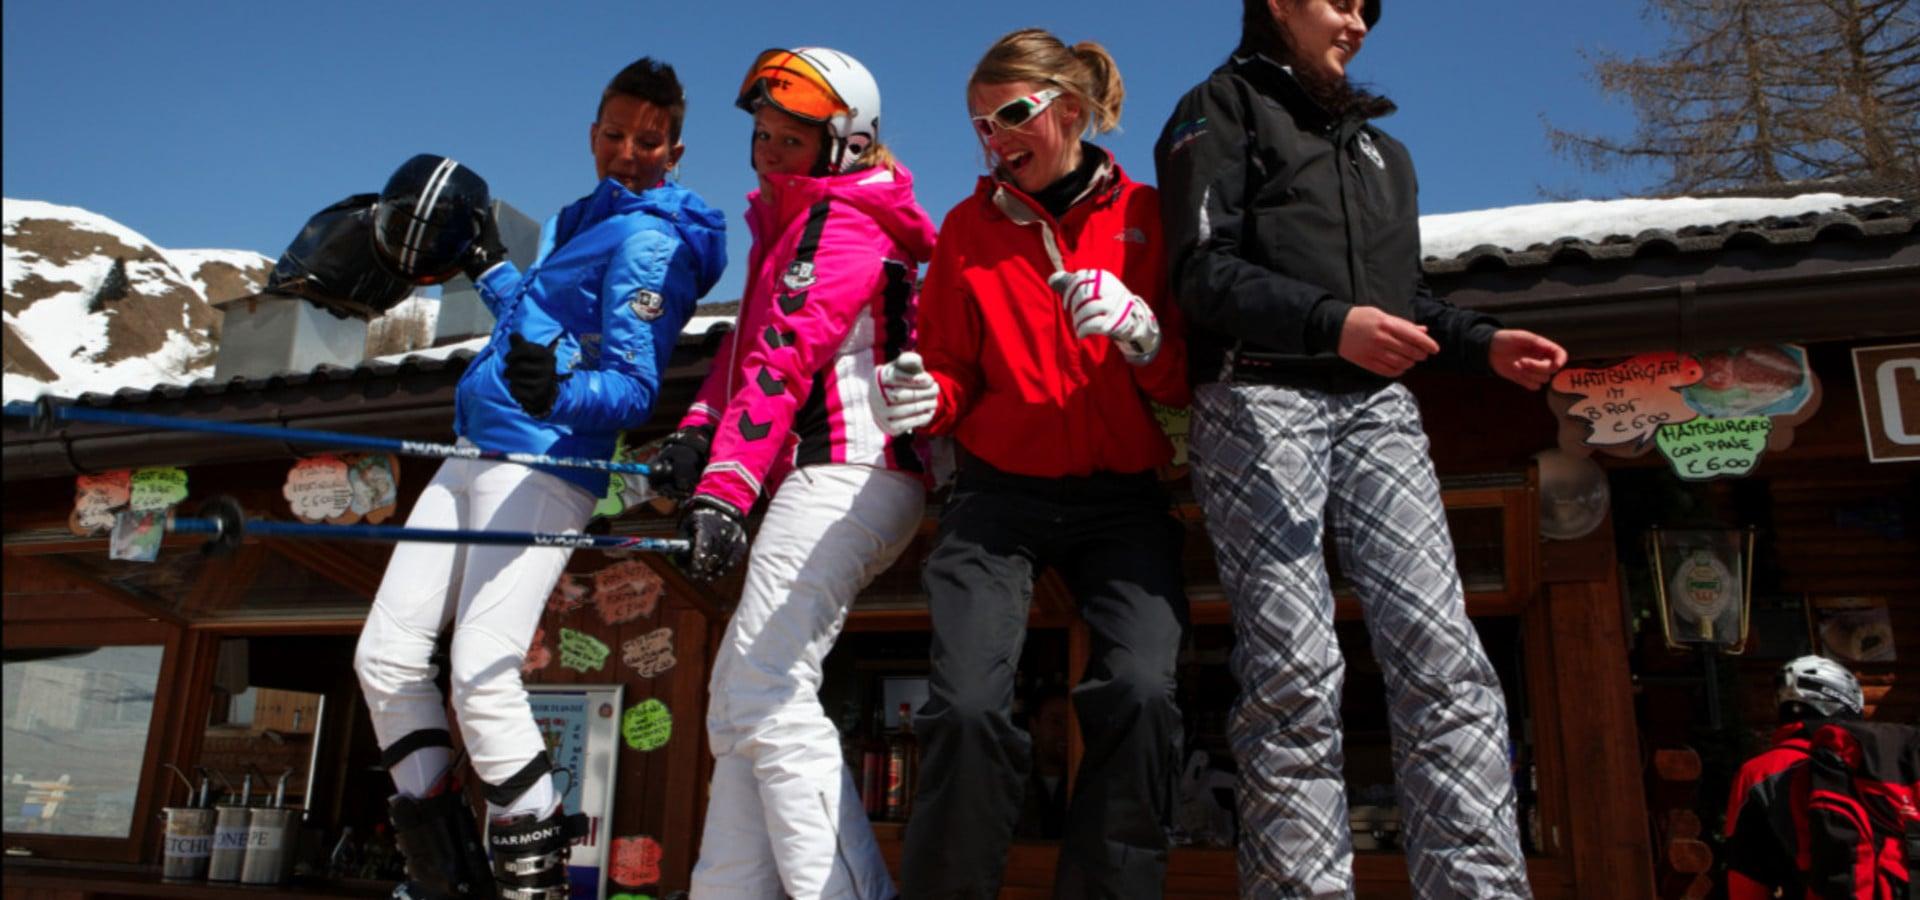 Après-Ski @ Rifugio Plan Boè